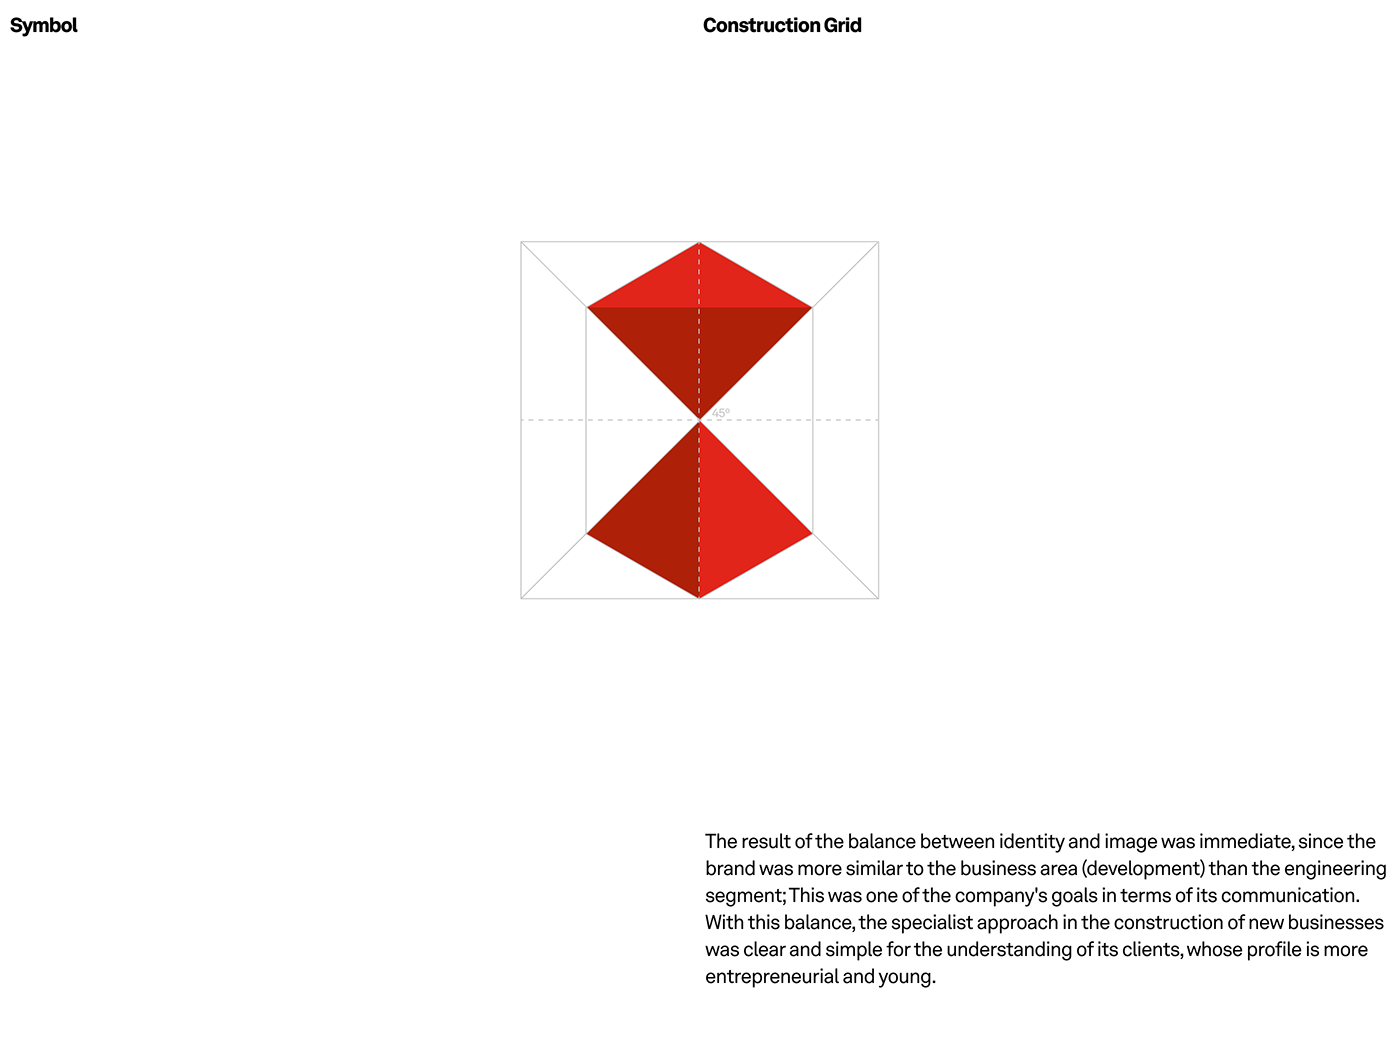 Brava, design construction grid of the symbol